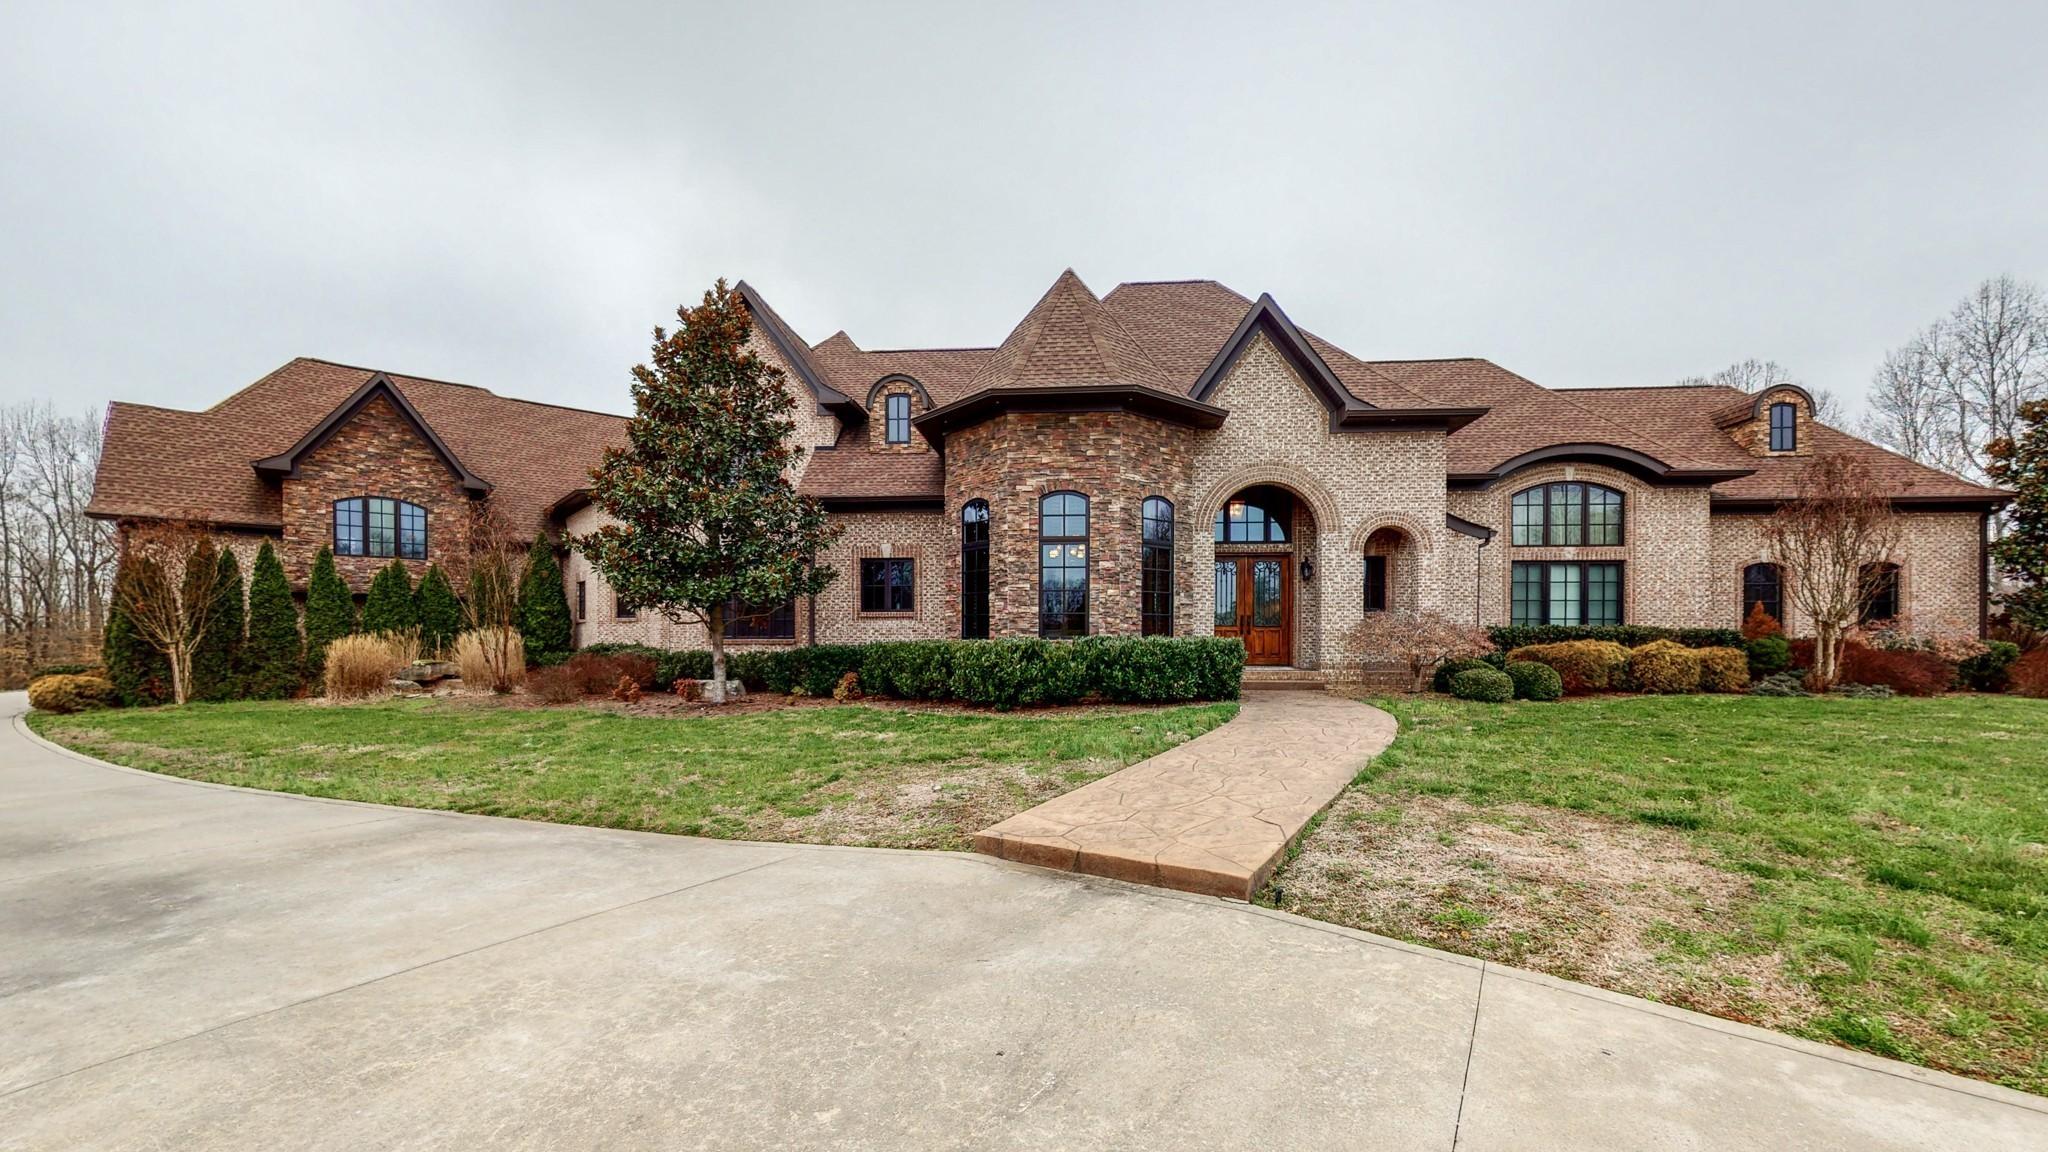 4776 Mickle Ln, Clarksville, TN 37043 - Clarksville, TN real estate listing